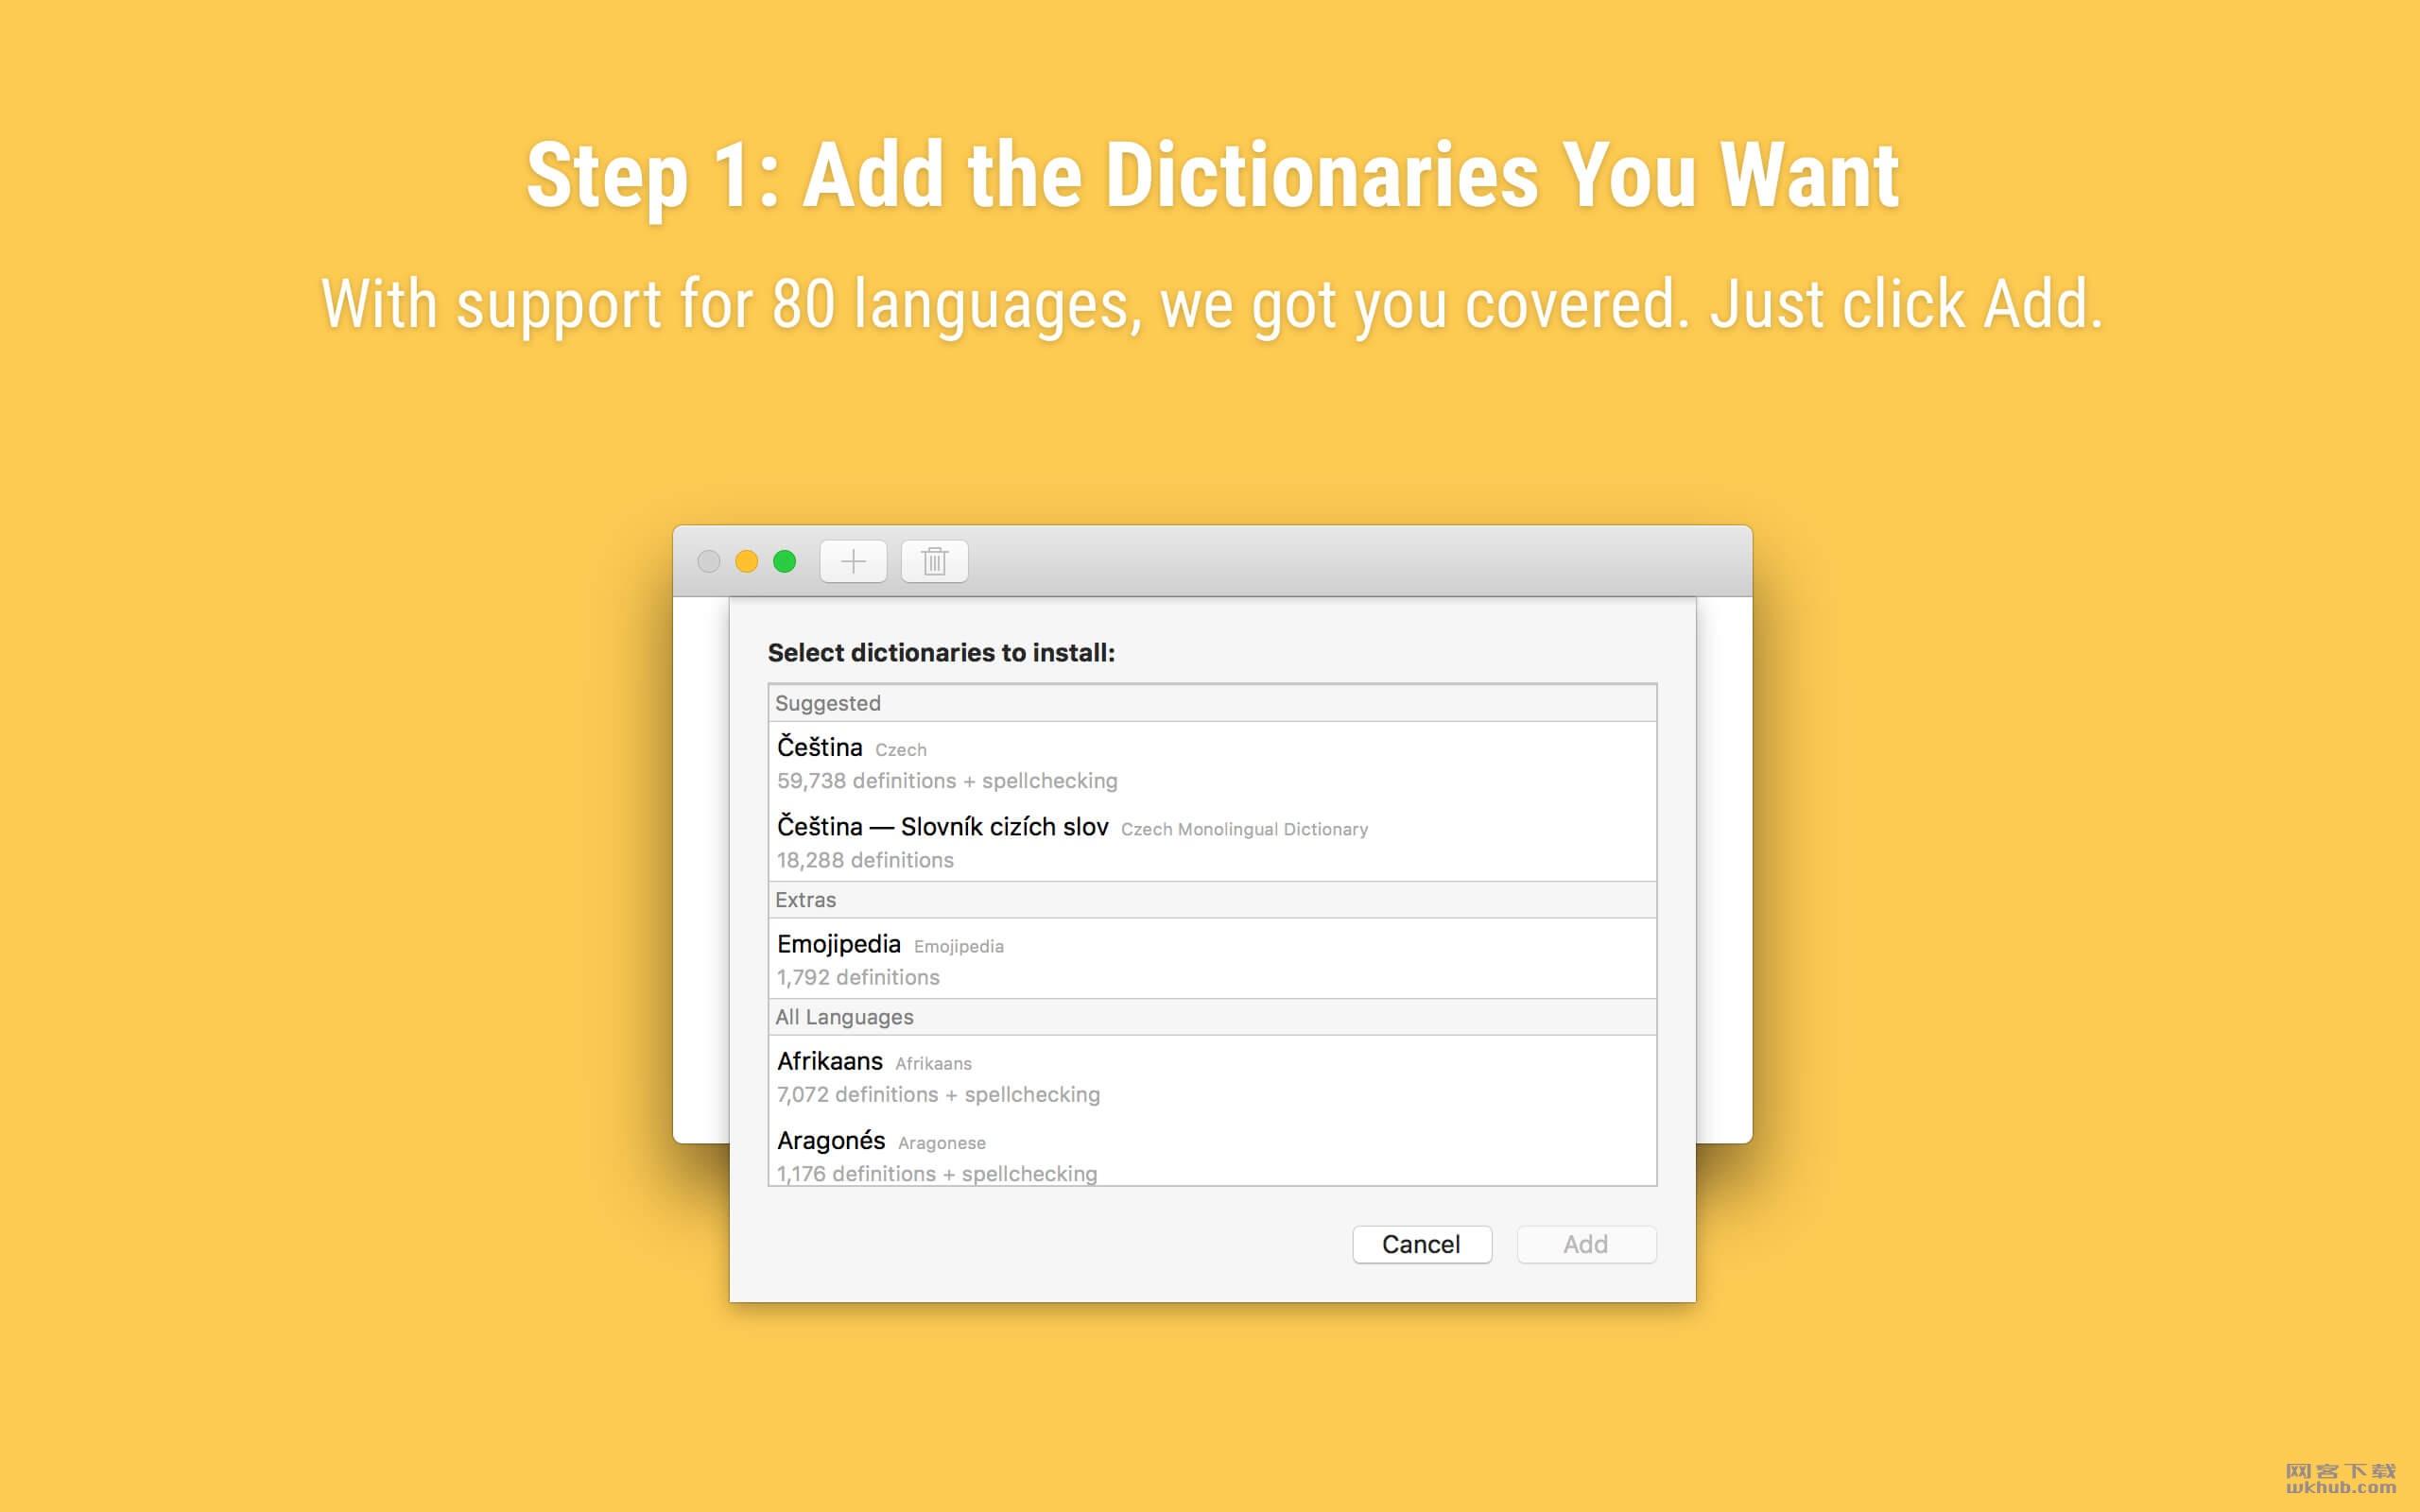 Dictionaries 1.3.3 易用的字典软件